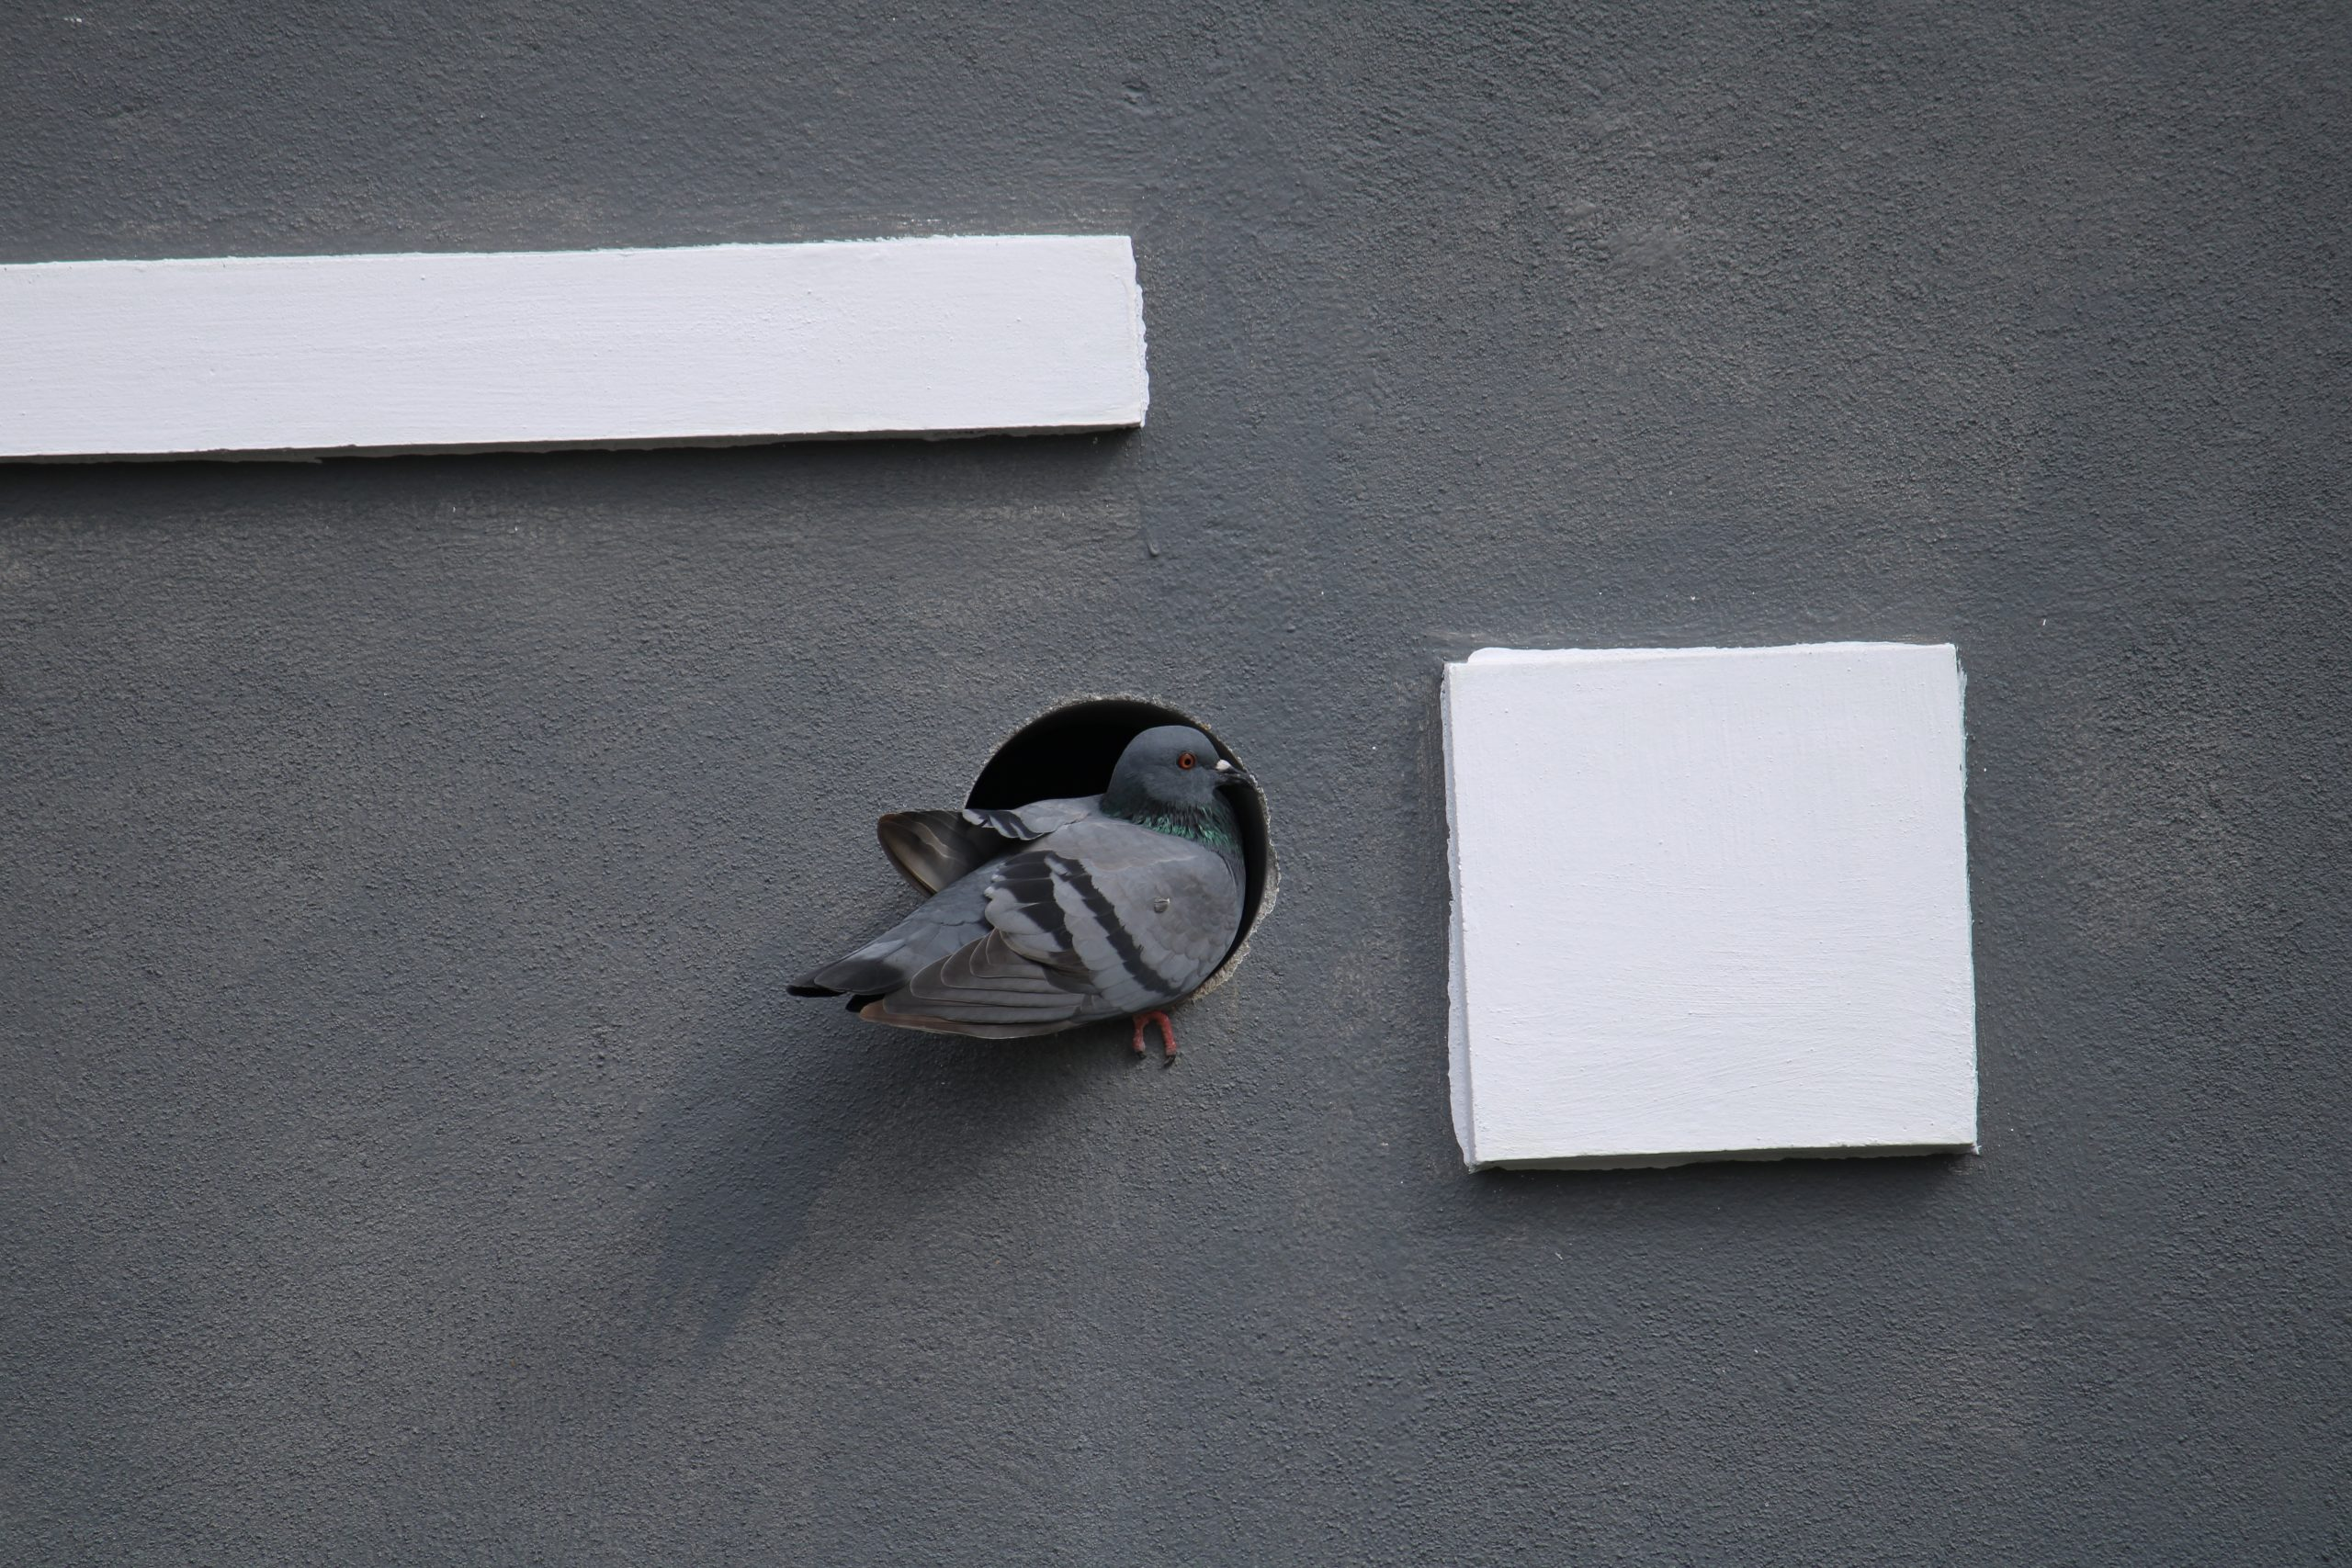 A dove entering into a pipe